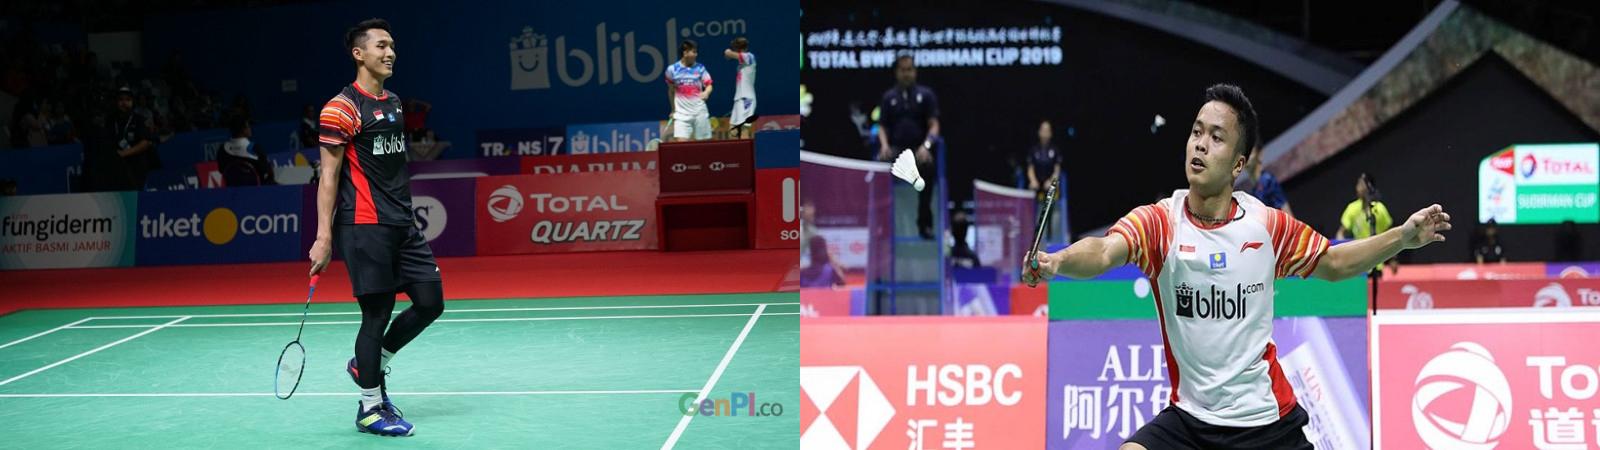 Jojo dan Anthony Sinisuka Ginting melaju ke babak ketiga Kejuraan Dunia 2019